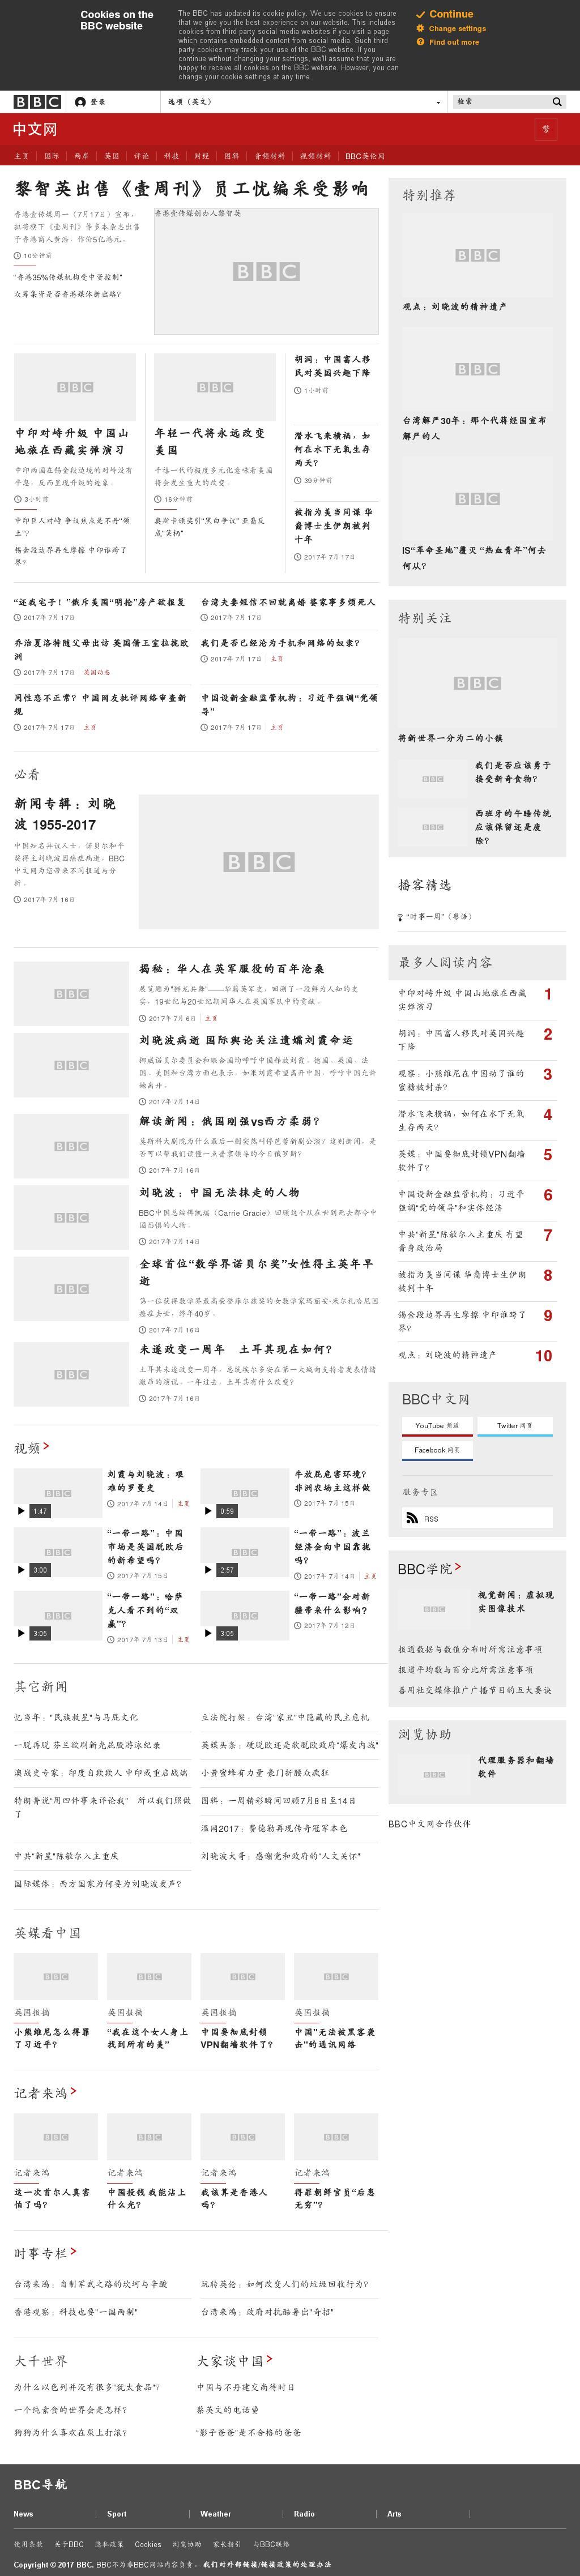 BBC (Chinese) at Tuesday July 18, 2017, 9 a.m. UTC